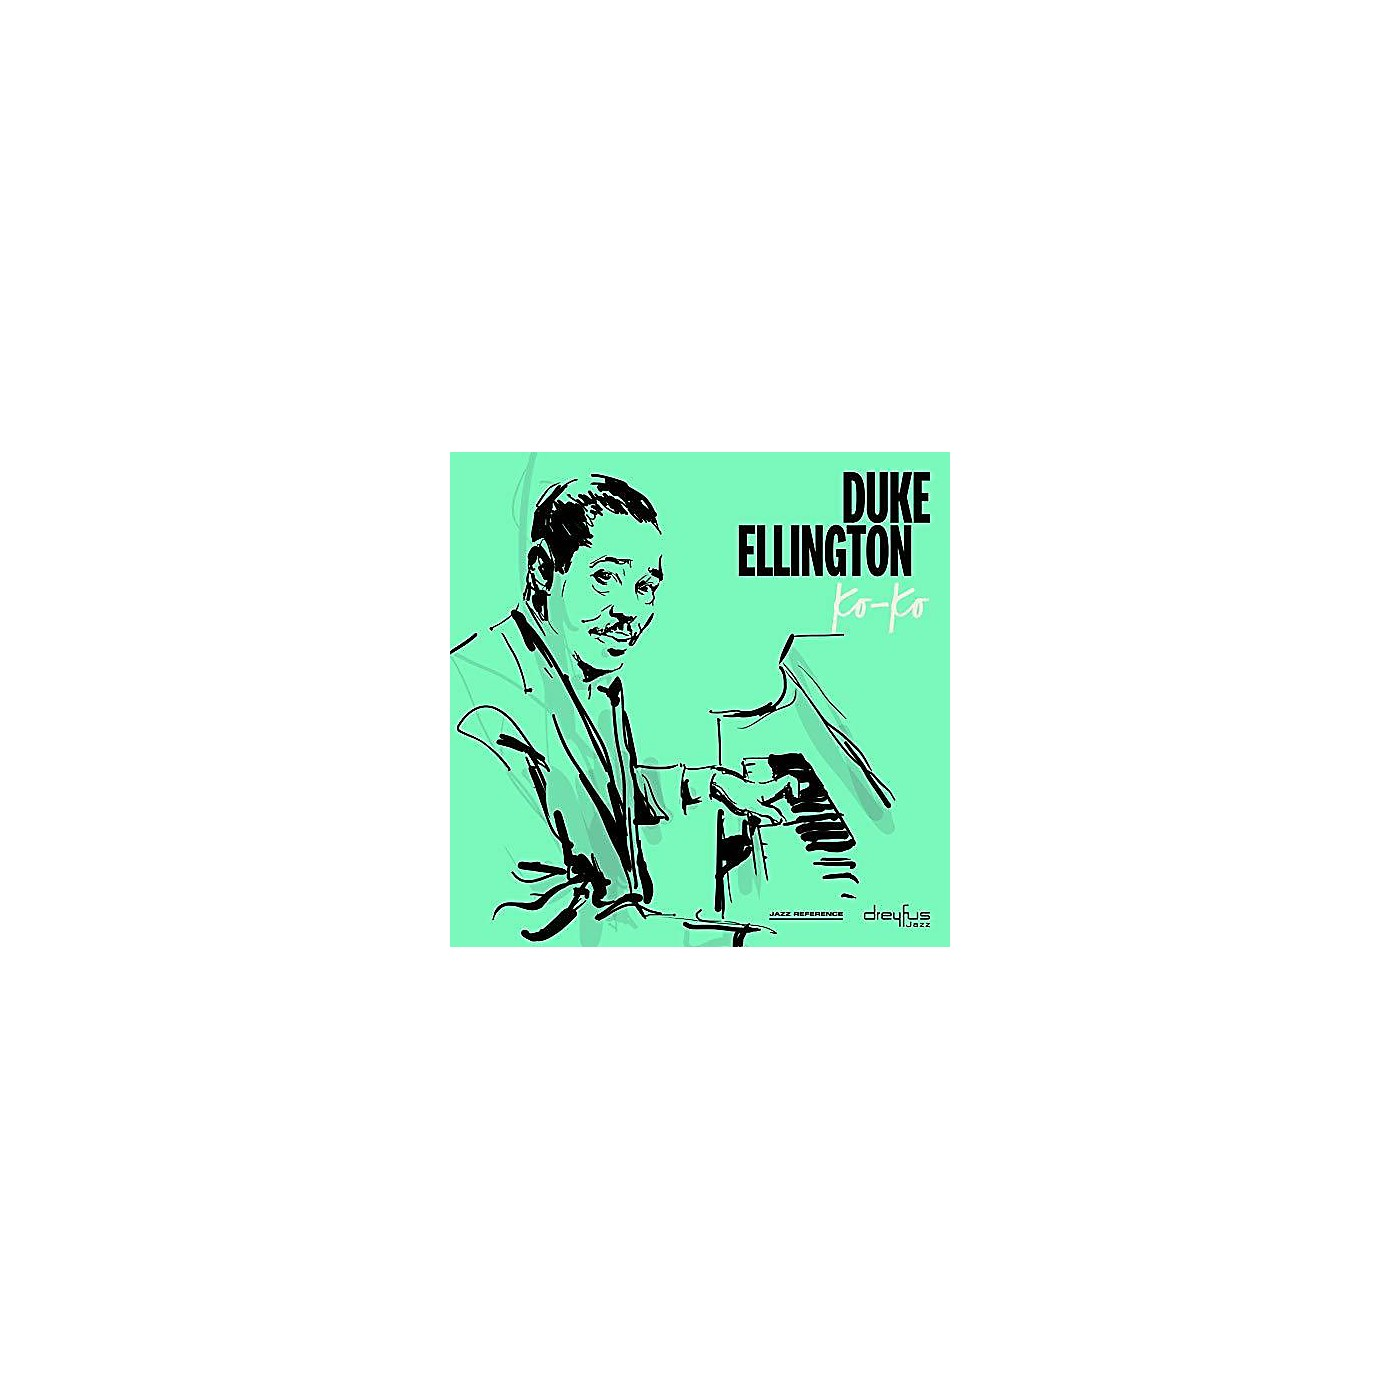 Alliance Duke Ellington - Ko-Ko thumbnail